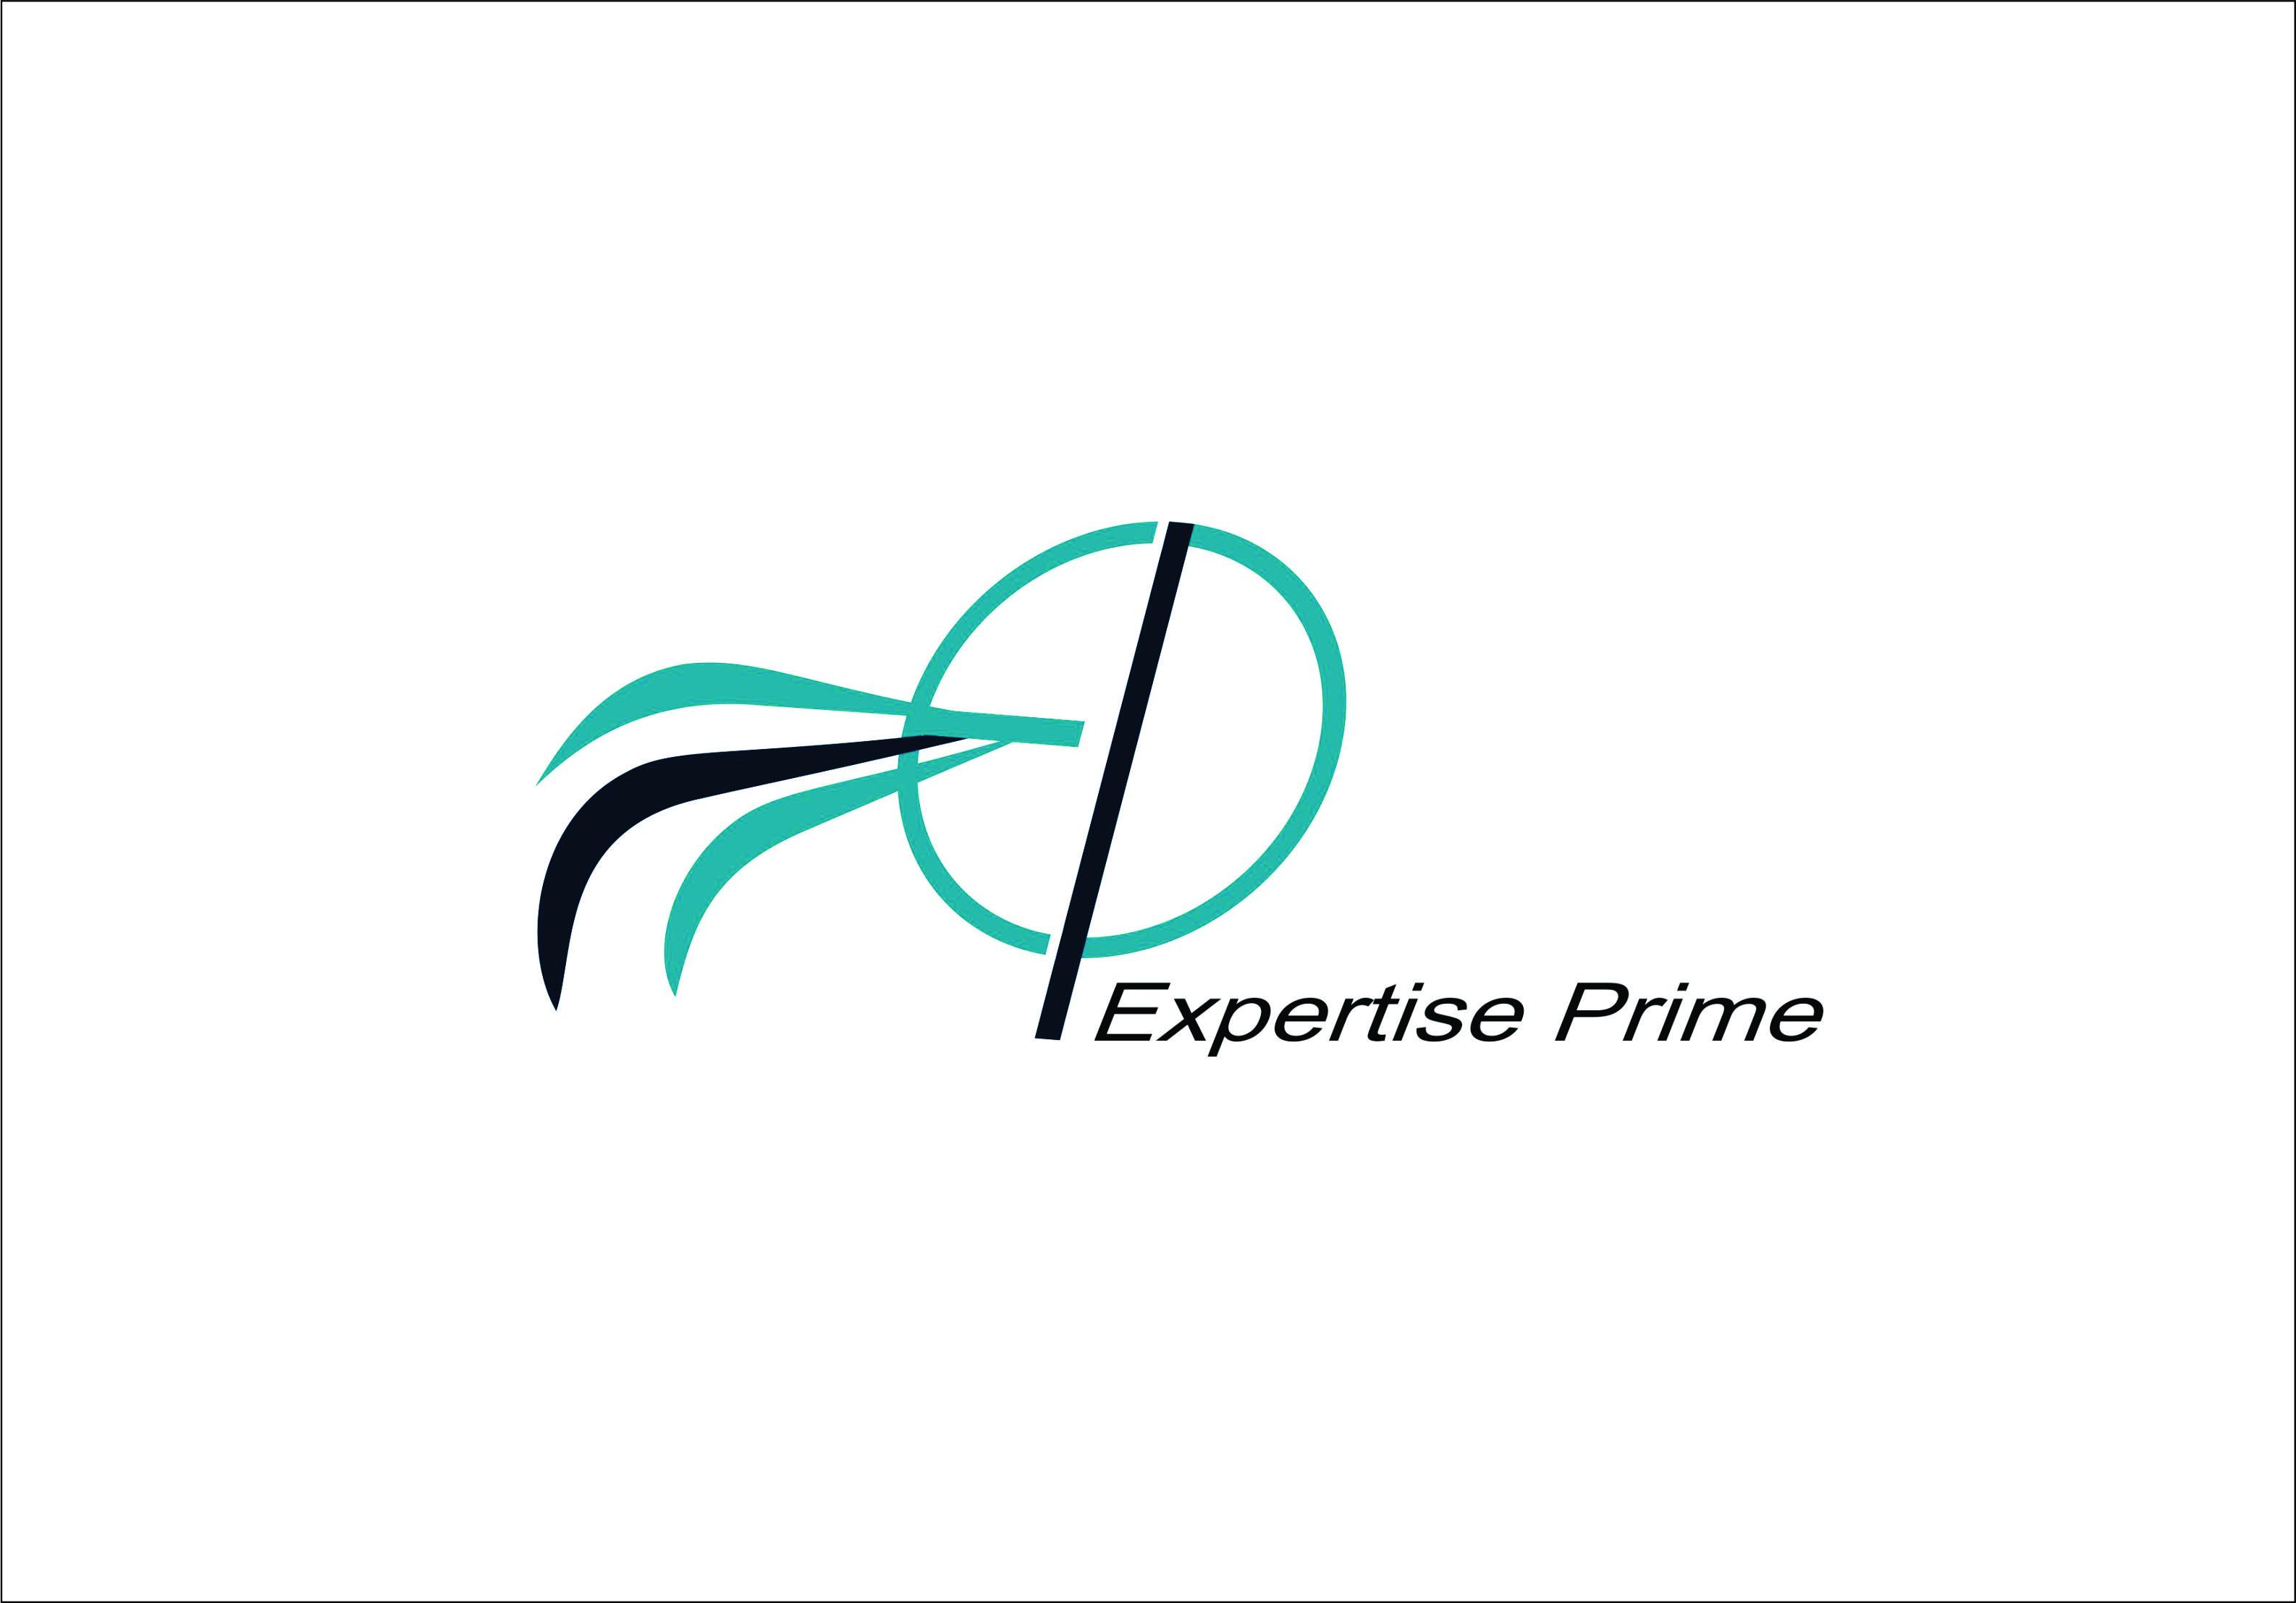 Expertise Prime